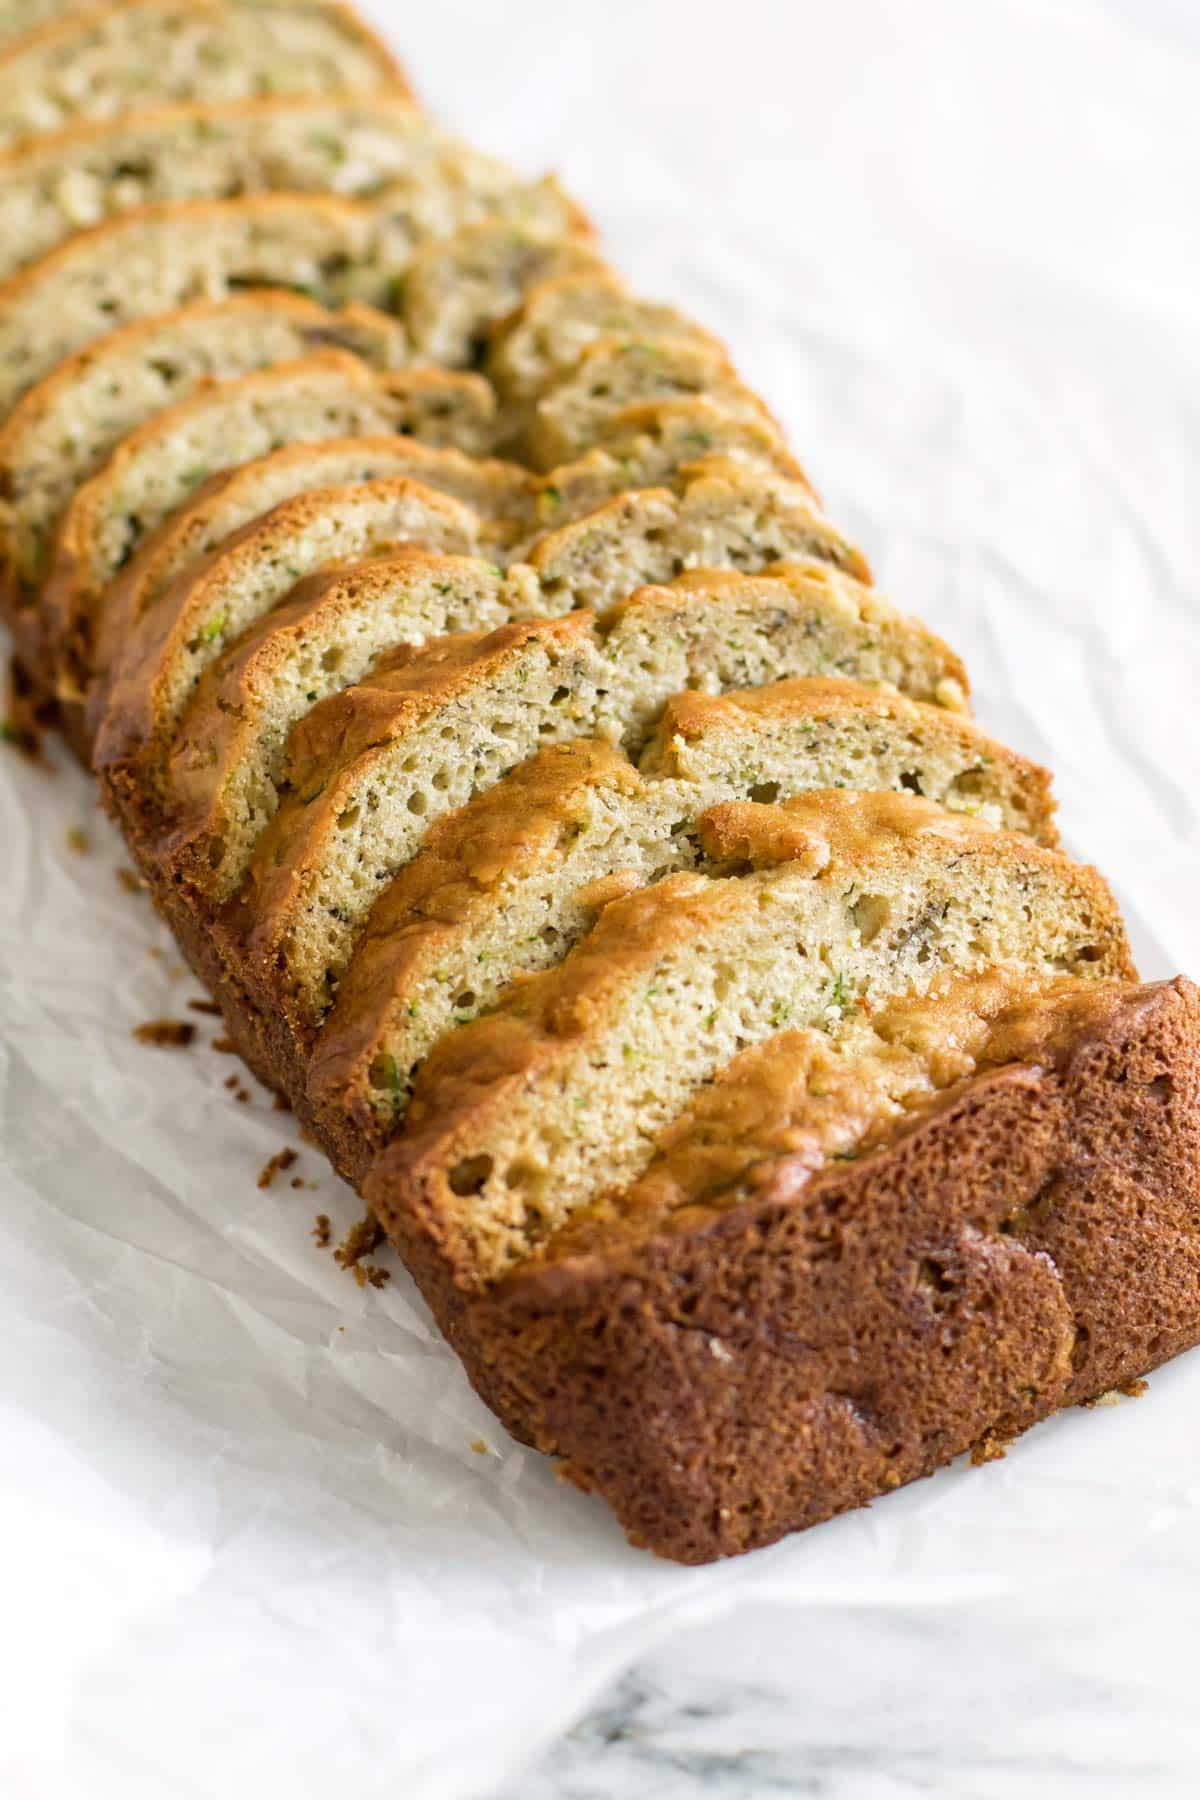 close-up photo of sliced zucchini bread